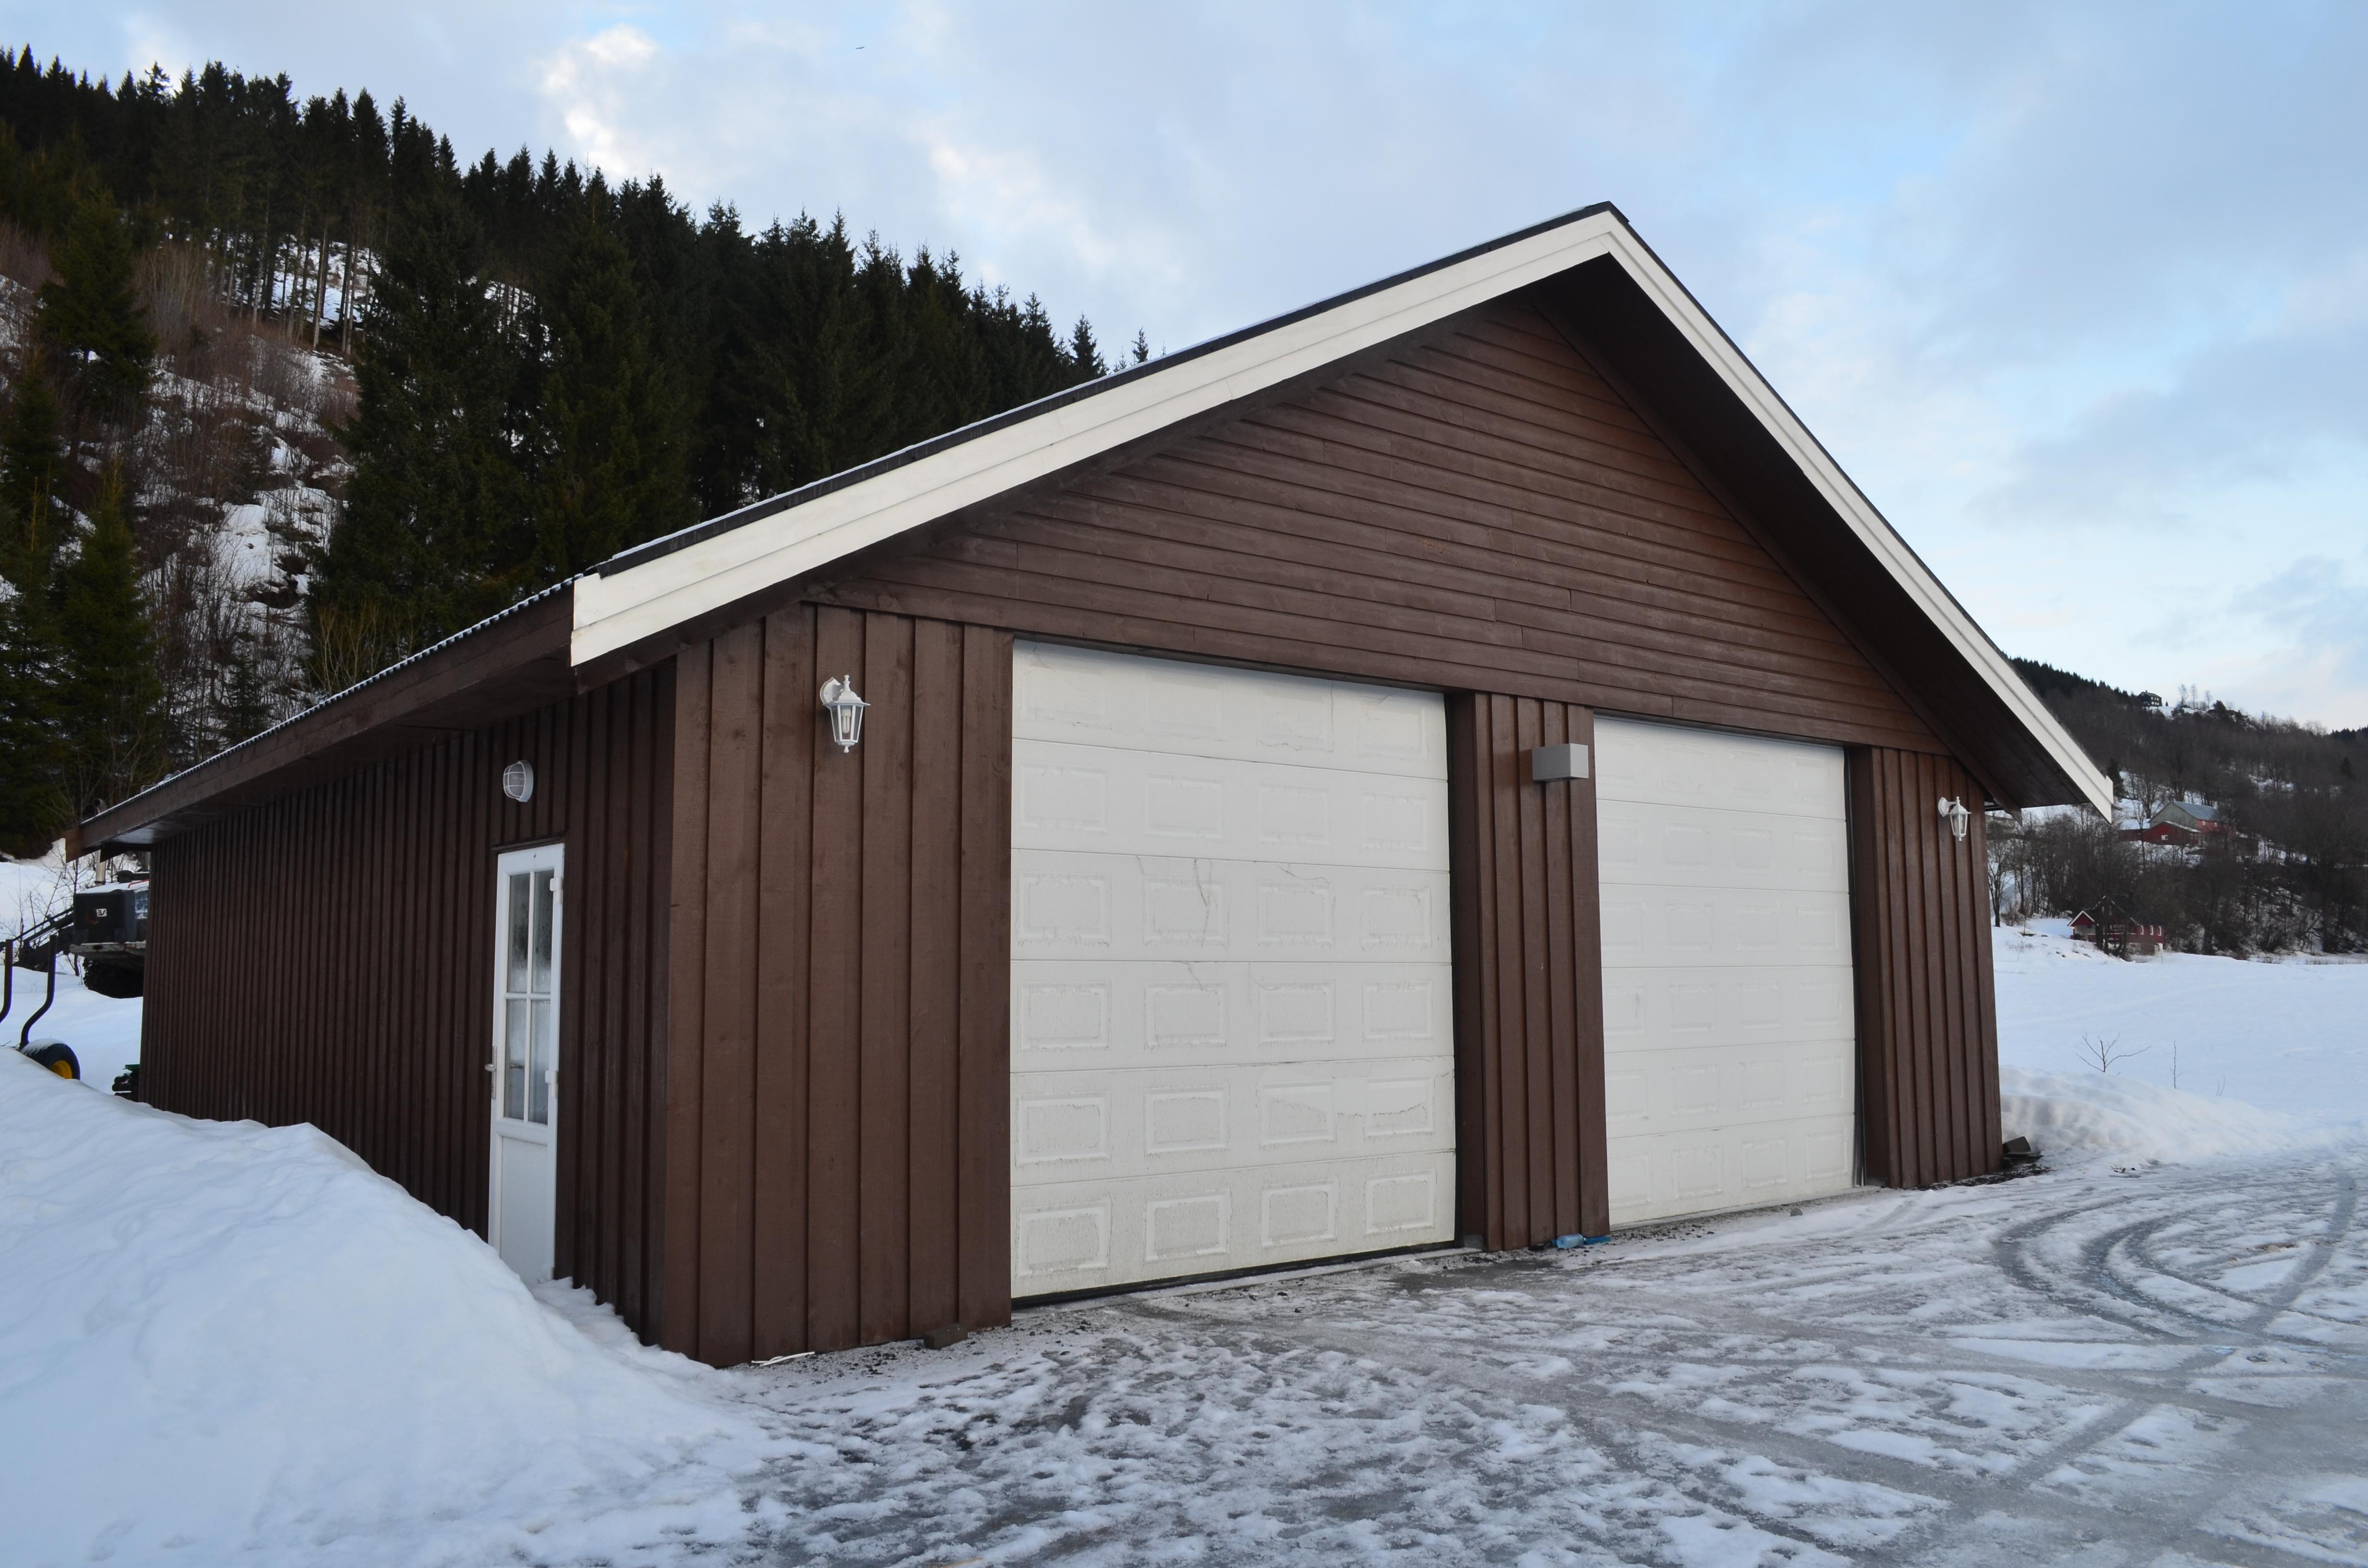 Strålende Ny Stålhaller-Lagerhaller-Verksted-Fjøs-Ridehall i alle FR-16